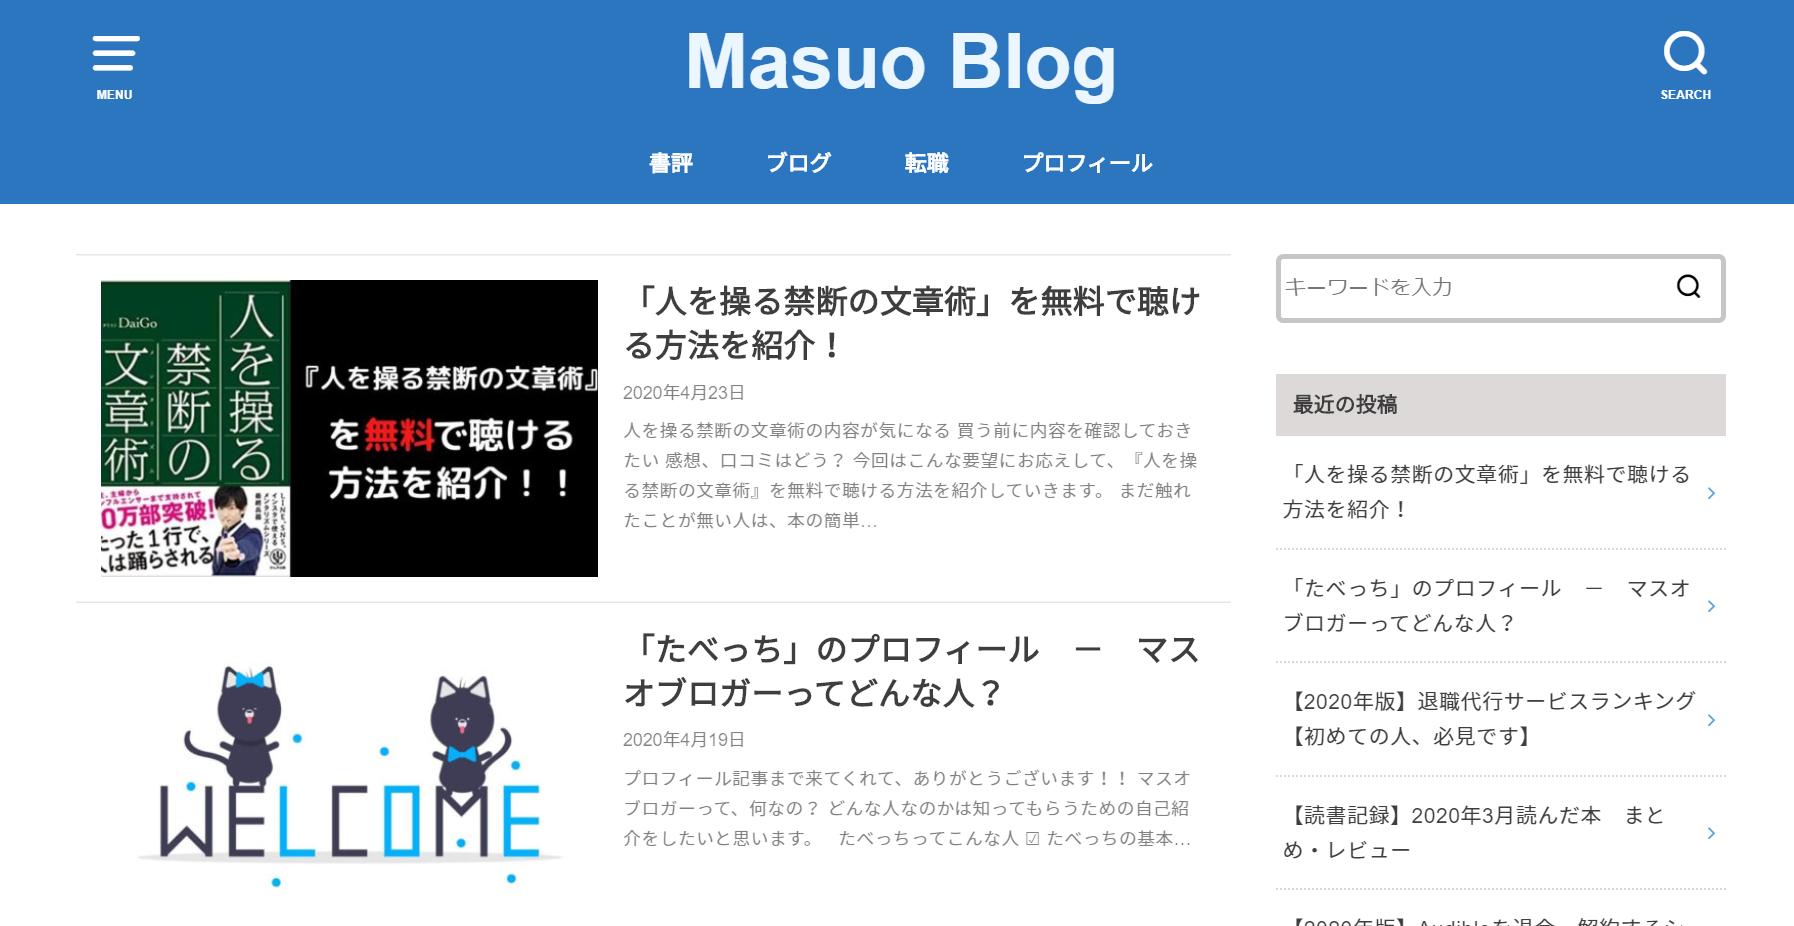 Masuo Blog